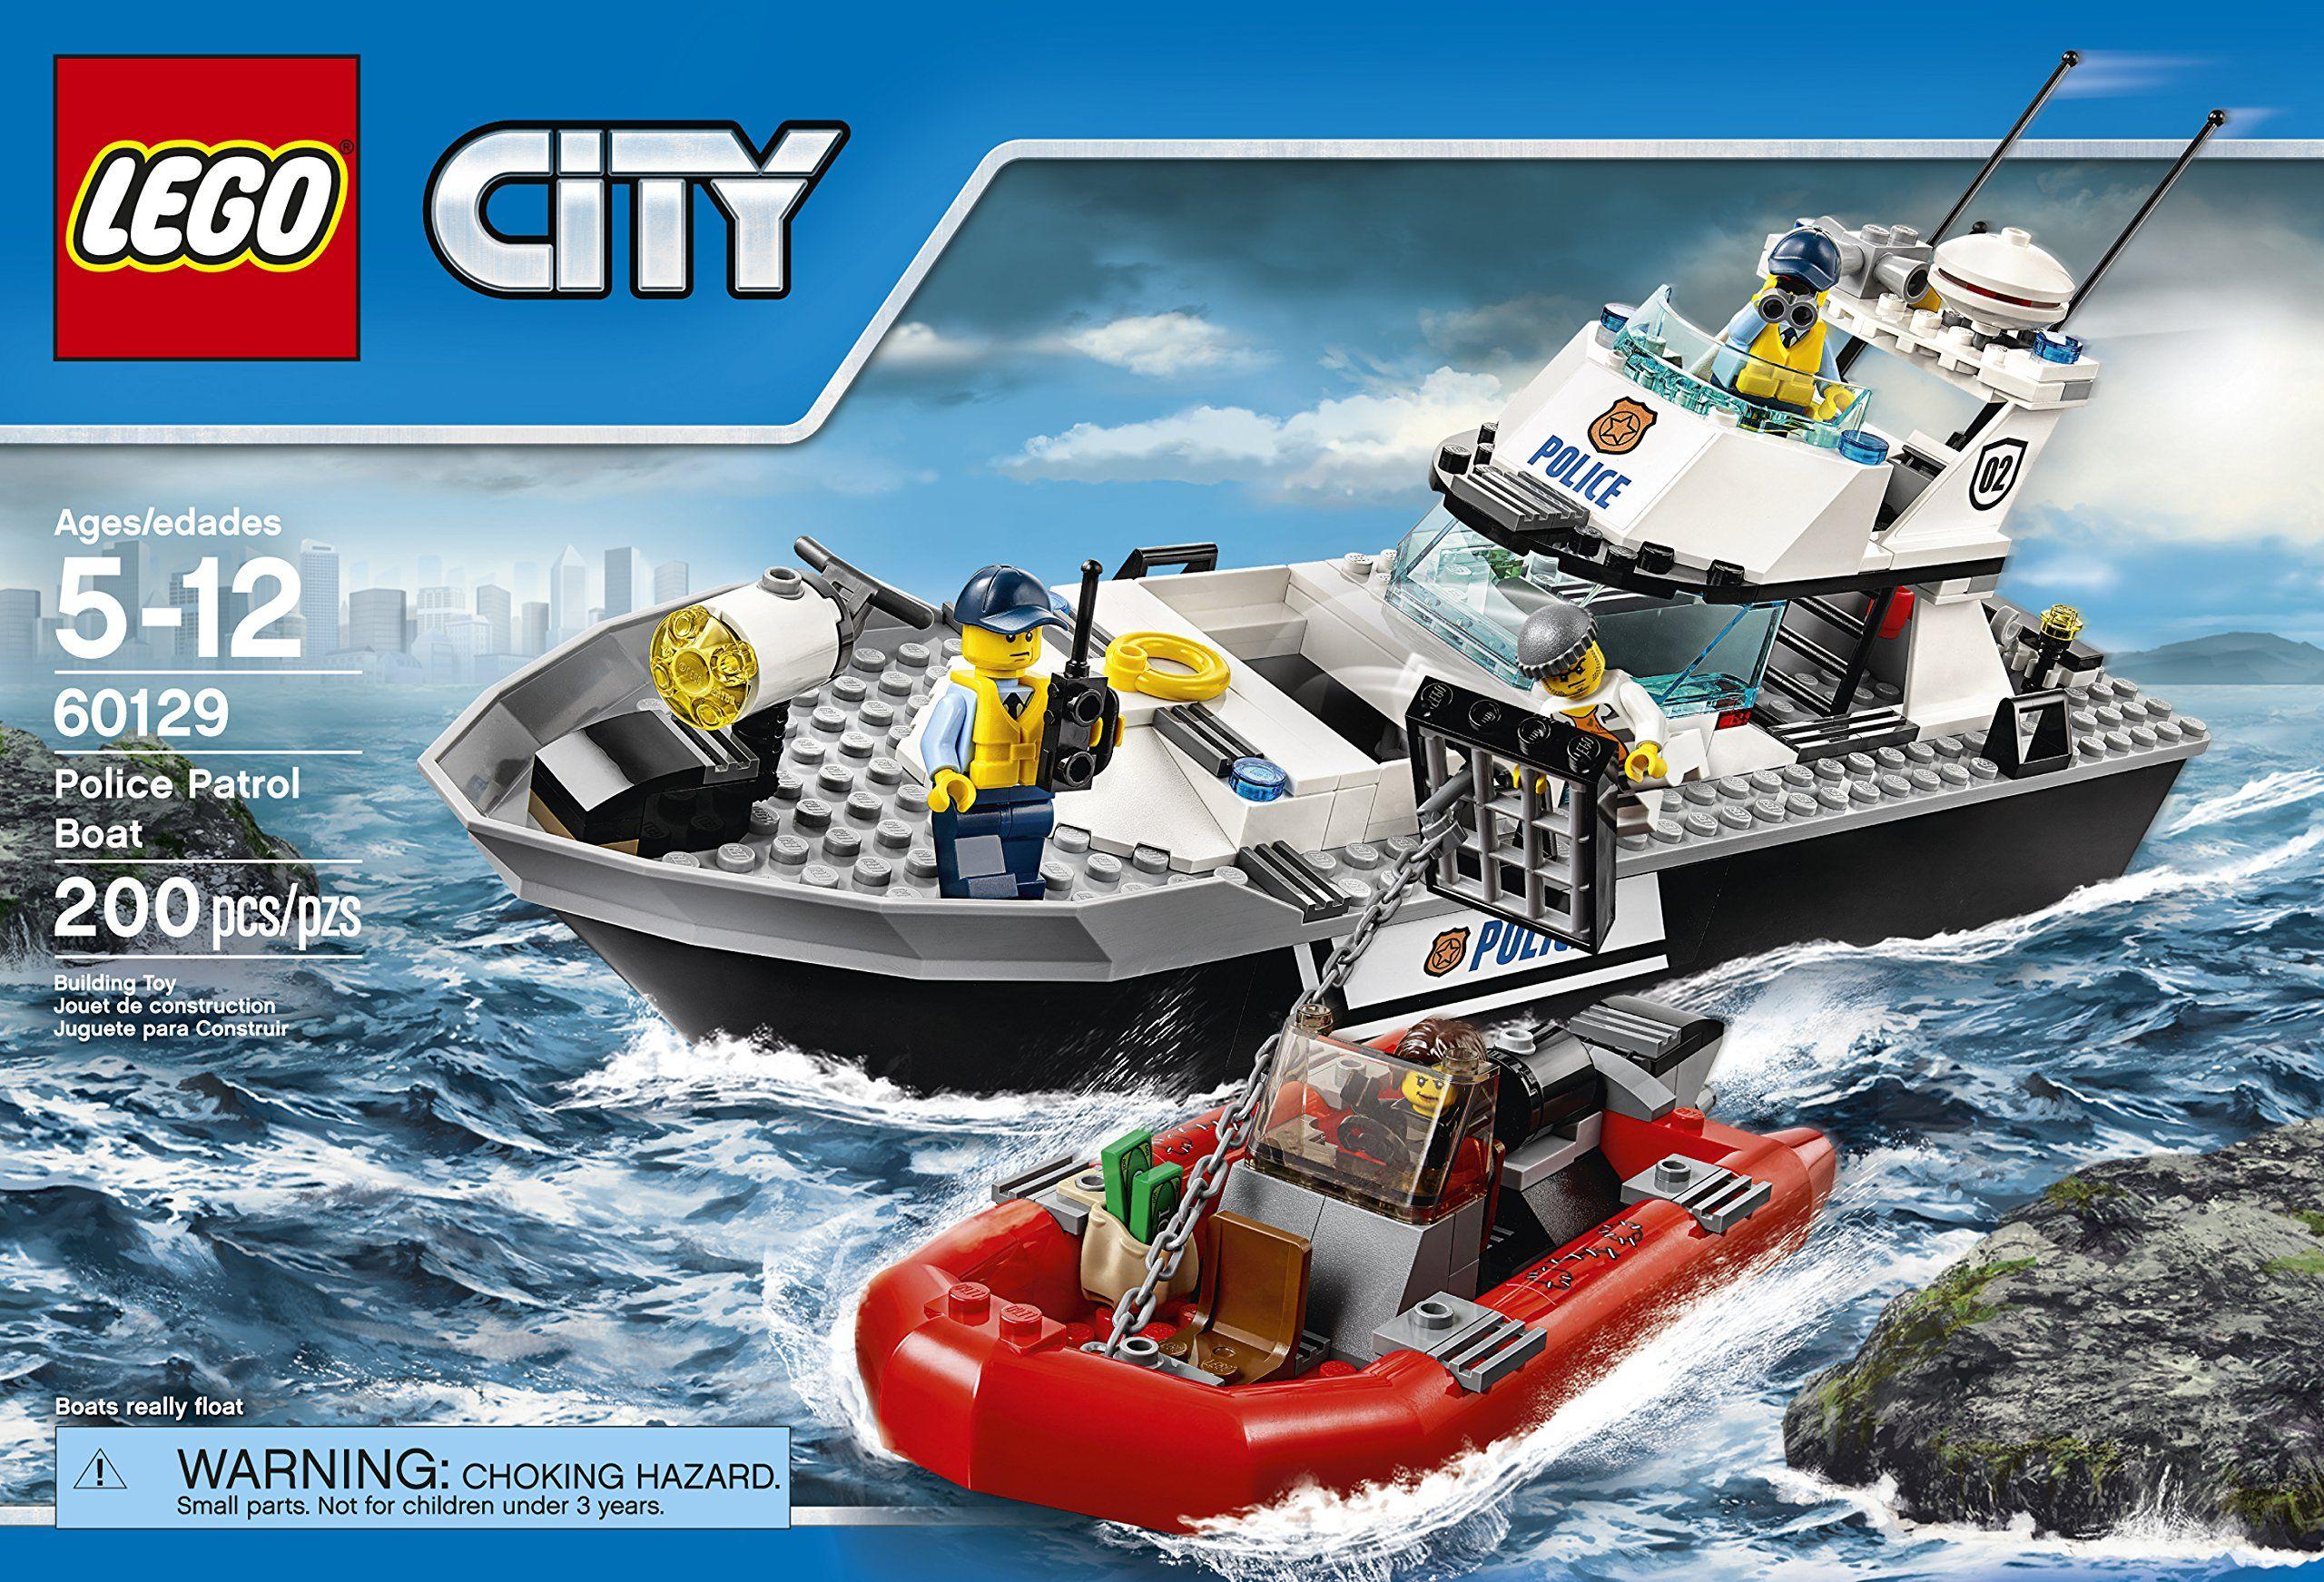 Amazon Com Lego City Police Patrol Boat 60129 Toys Games Lego City Police Lego City Lego City Sets